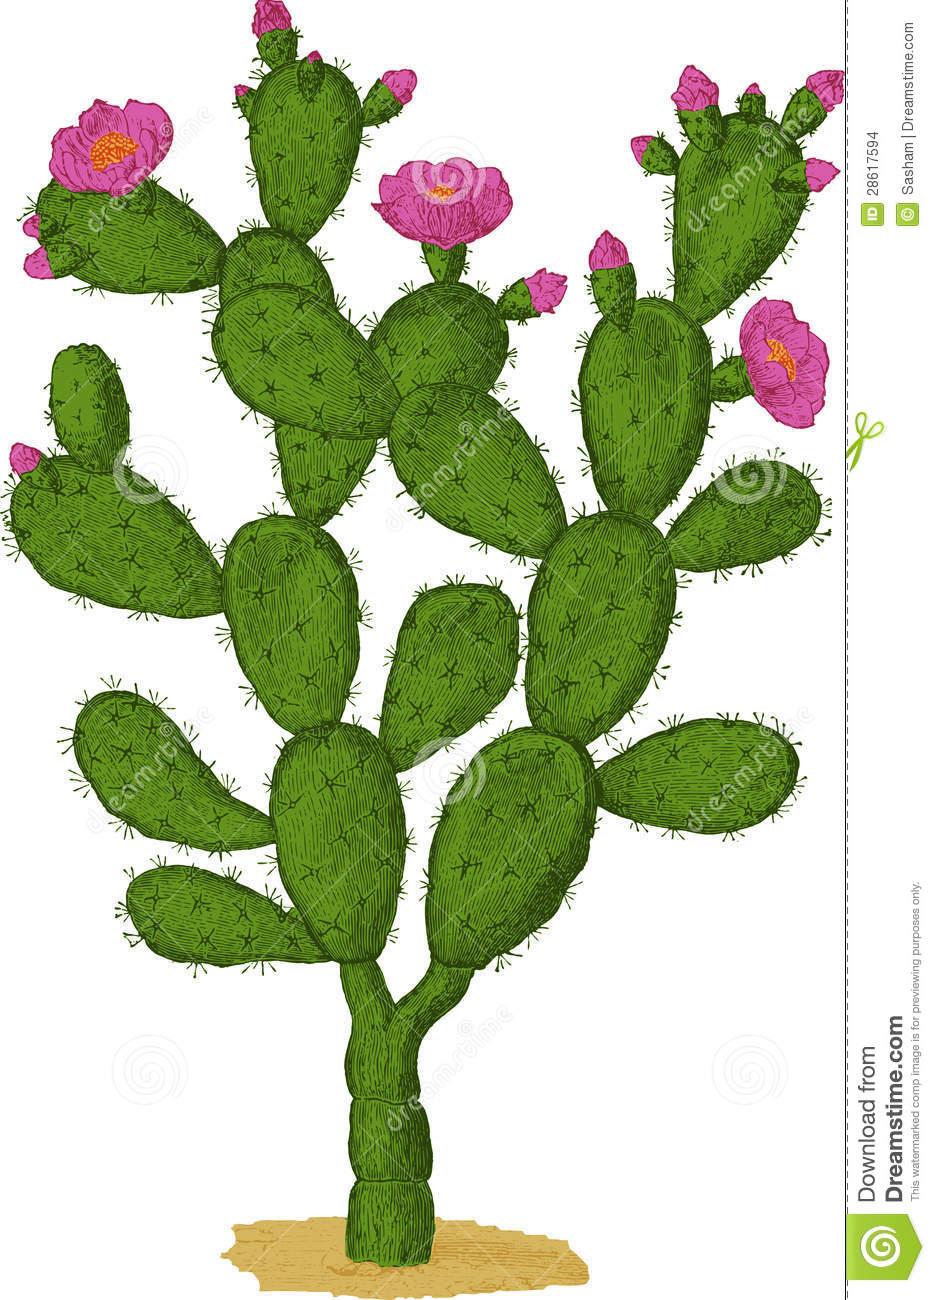 Prickly pear cactus clipart.